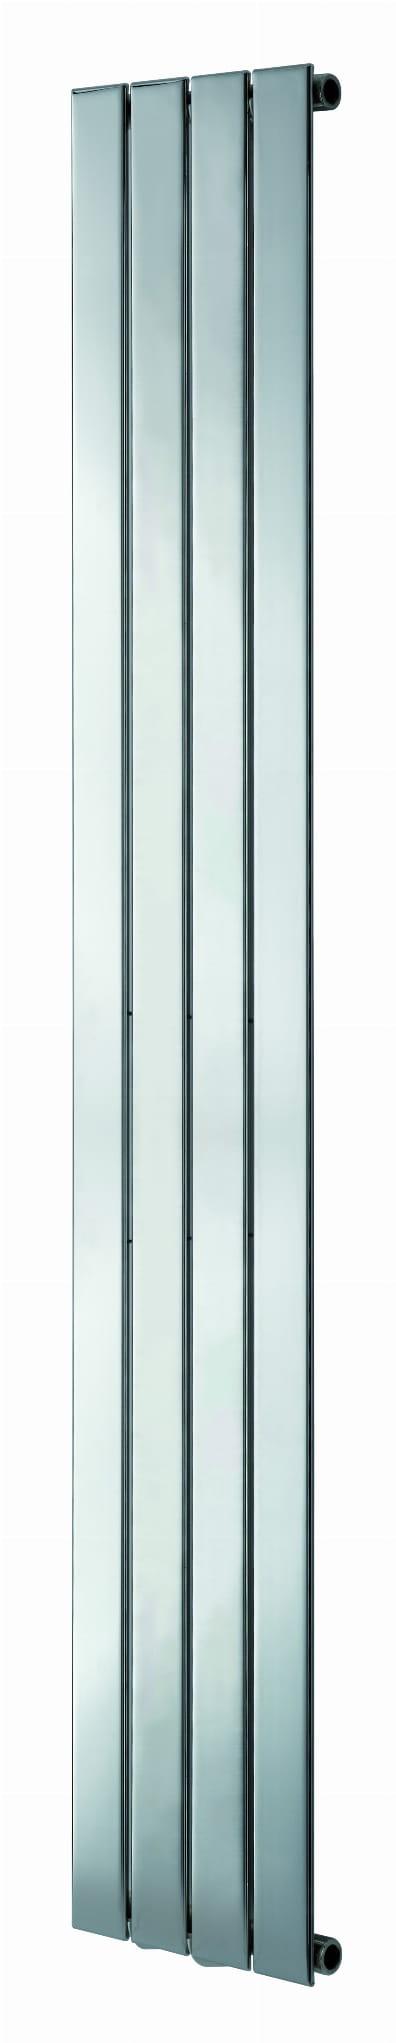 Sanotechnik - EISENSTADT - Dekoratívny kúpeľňový radiátor chróm 354 W 309x1800 mm